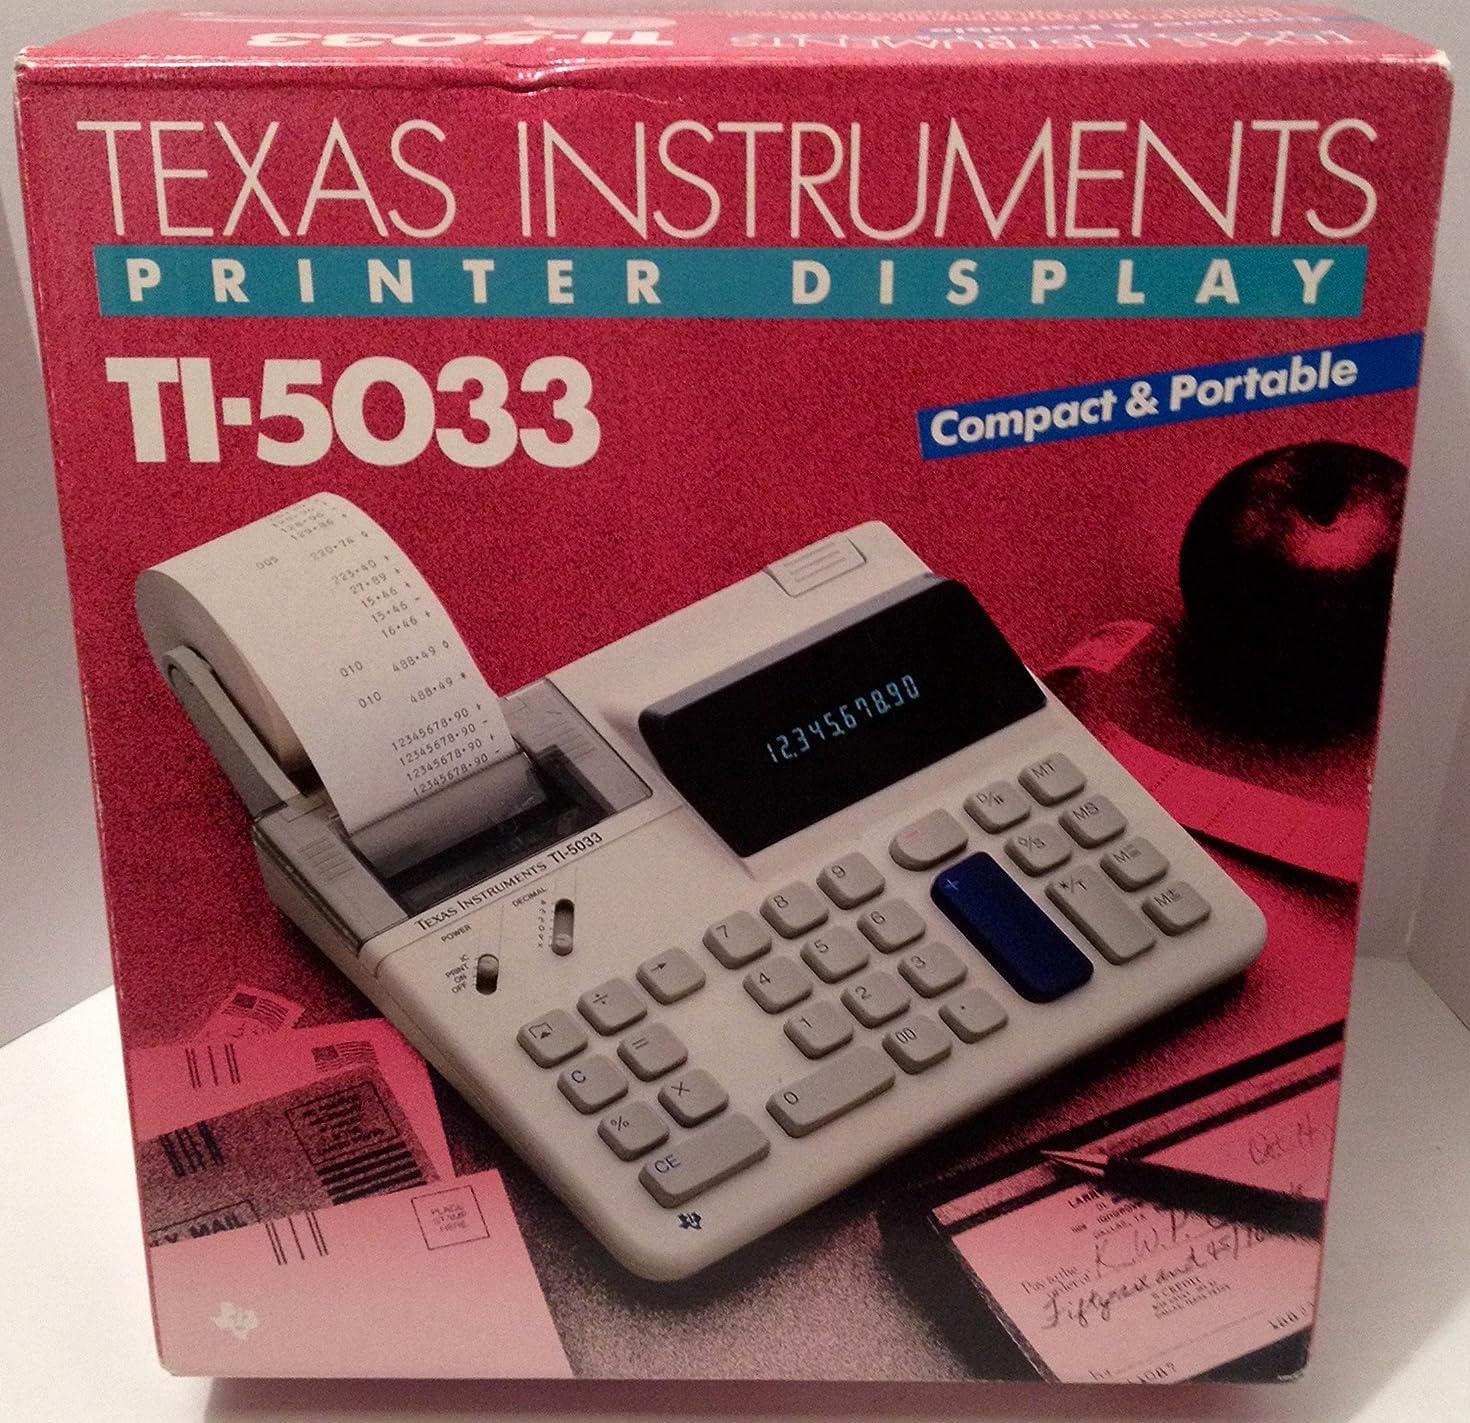 Texas Instruments TI-5033 Printing Calculator